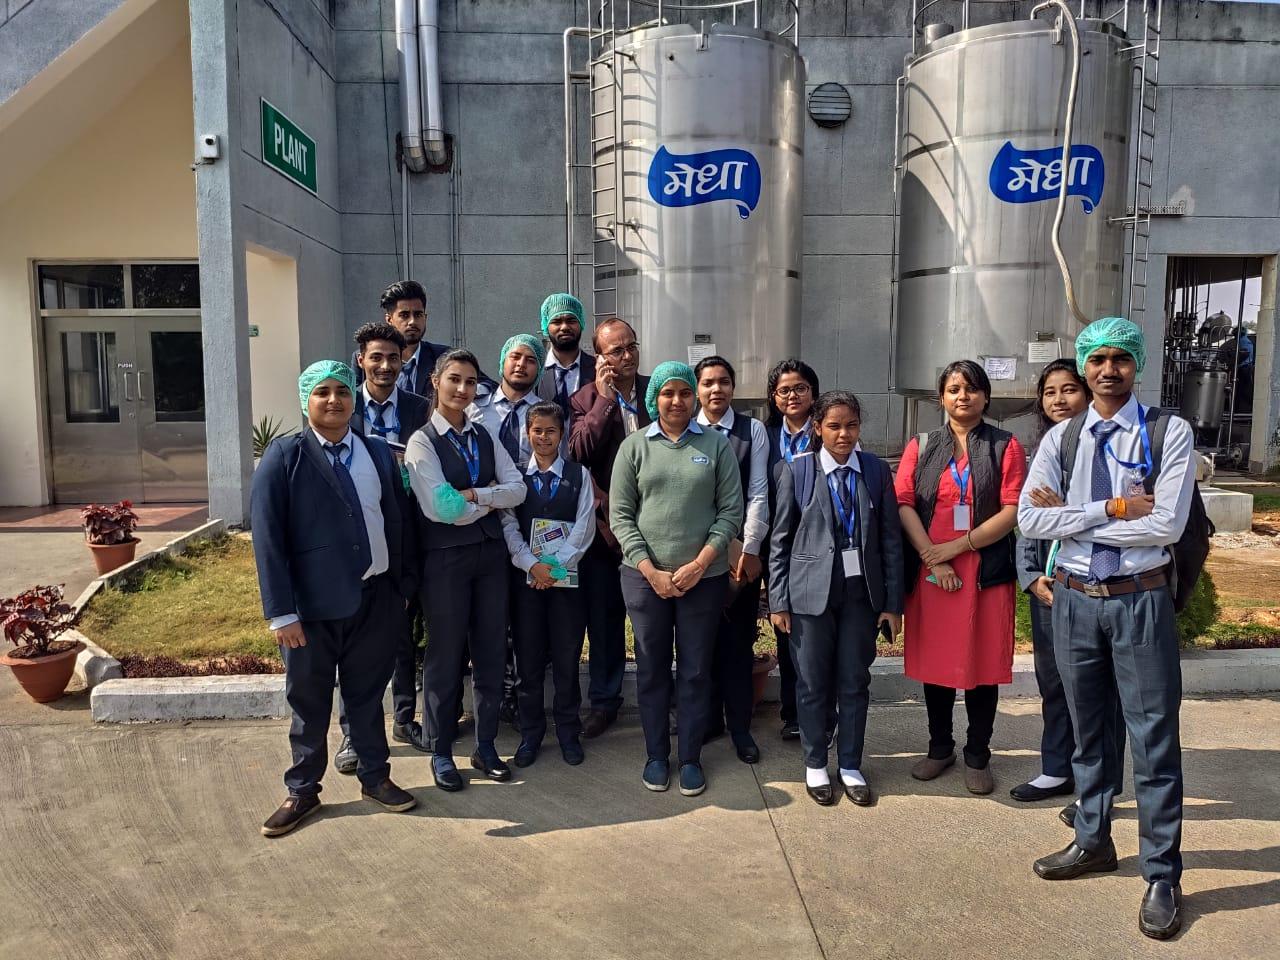 SBU Organized Industrial Visit to Medha Diary - 29th Nov,2019